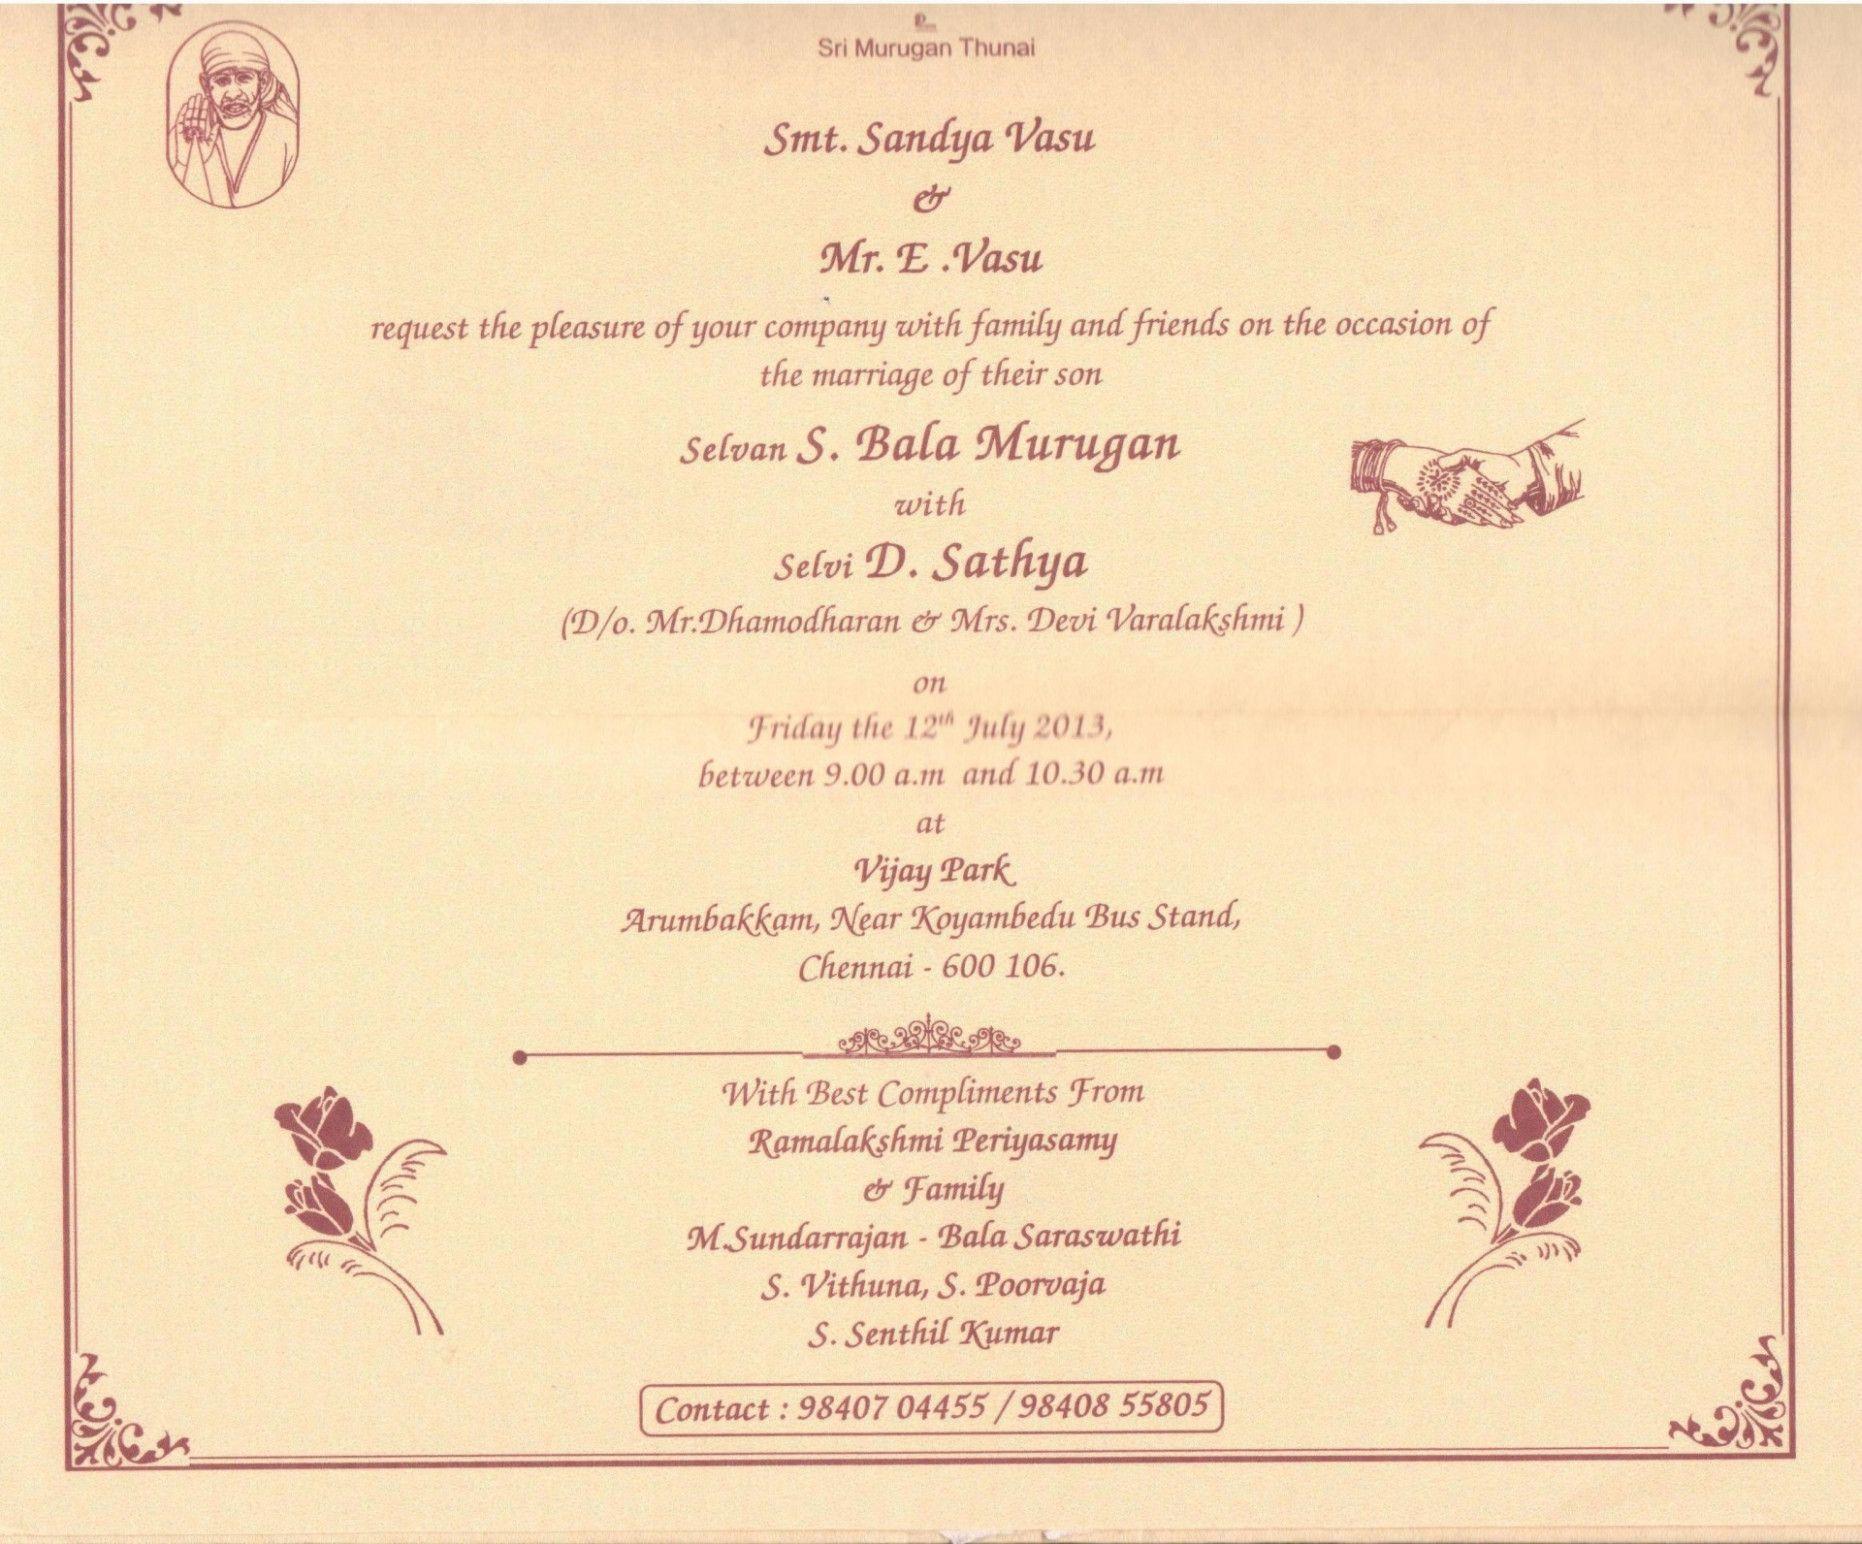 Wedding Card Wording In English In Indian Style Wedding Card Wordi In 2020 Wedding Reception Invitations Hindu Wedding Invitation Cards Indian Wedding Invitation Cards